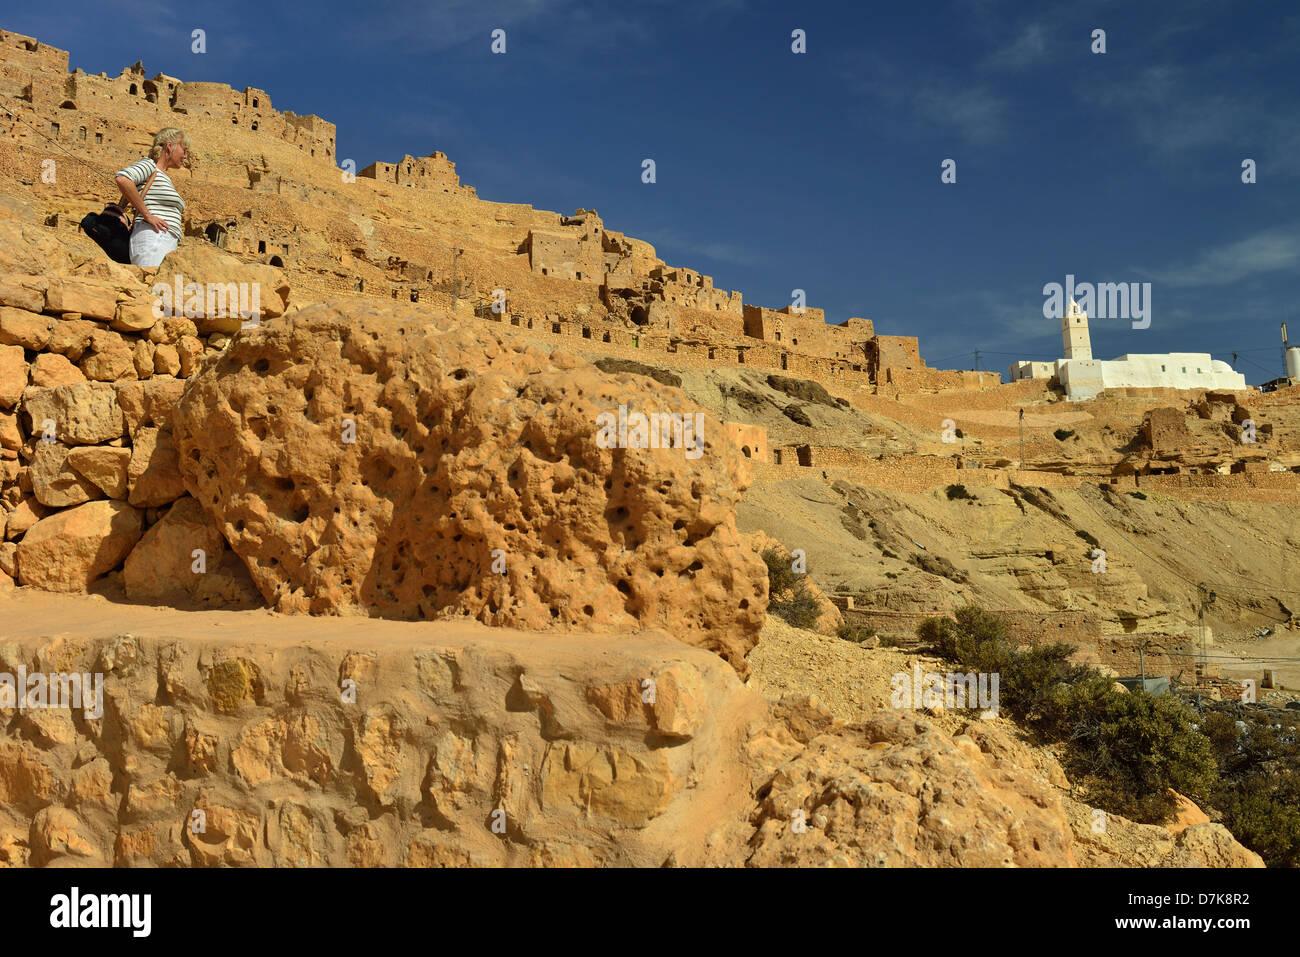 Ksar Chenini, Tataouine Province, Tunesia. - Stock Image